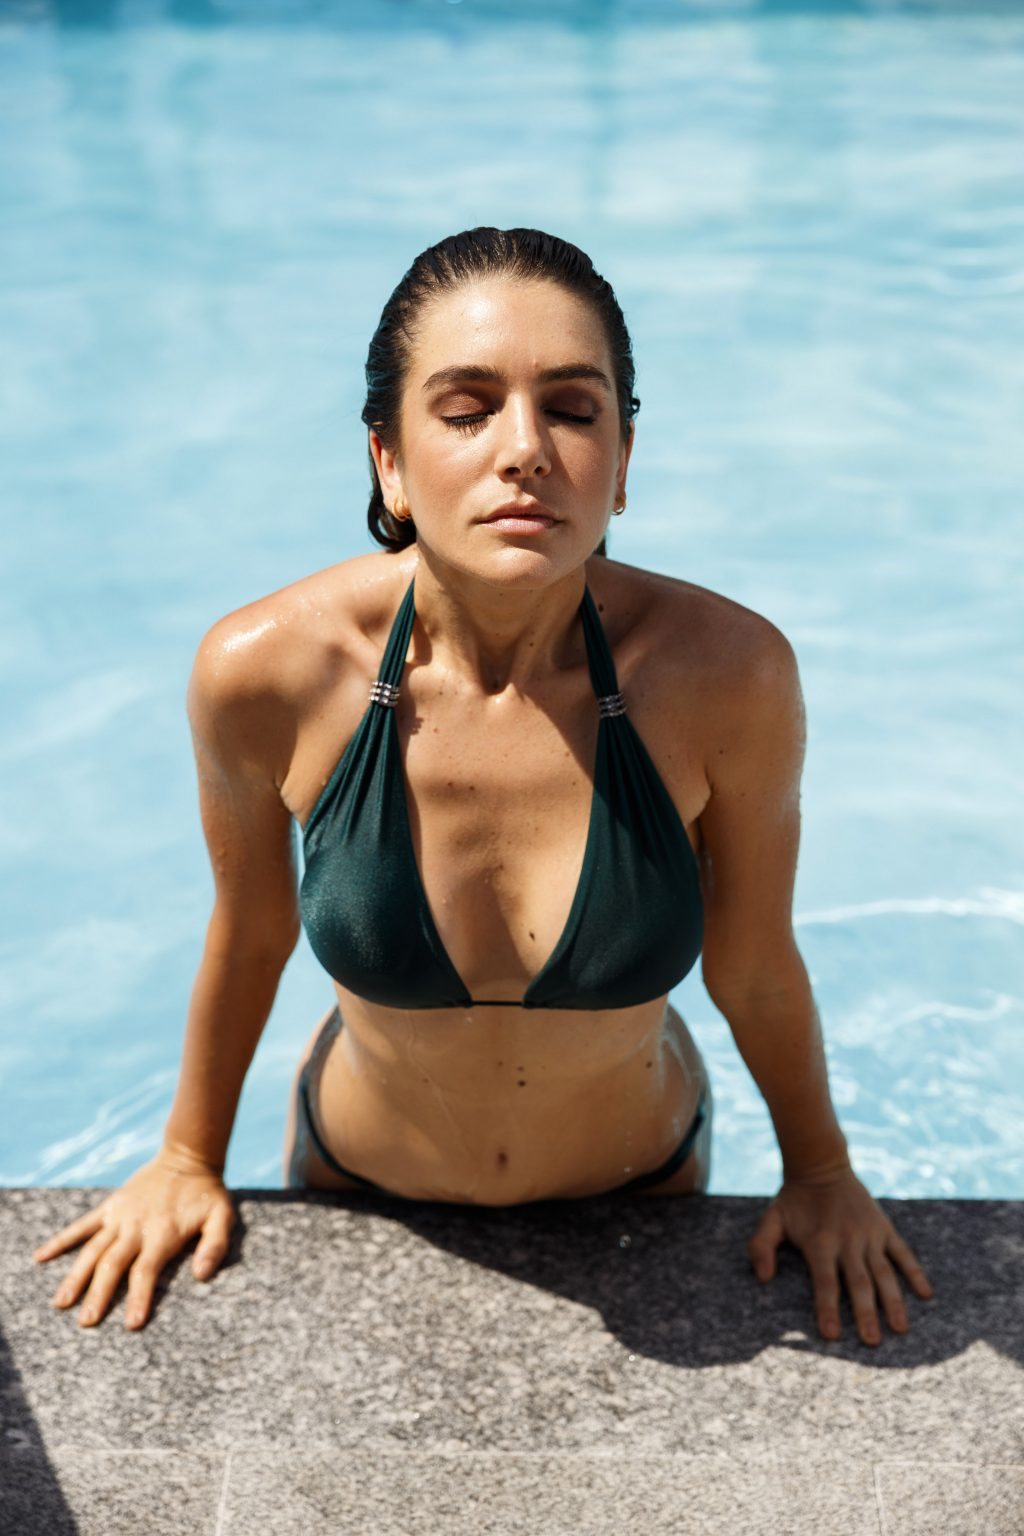 2019 Amanda Marie Pizziconi nudes (48 photos), Tits, Hot, Feet, bra 2015